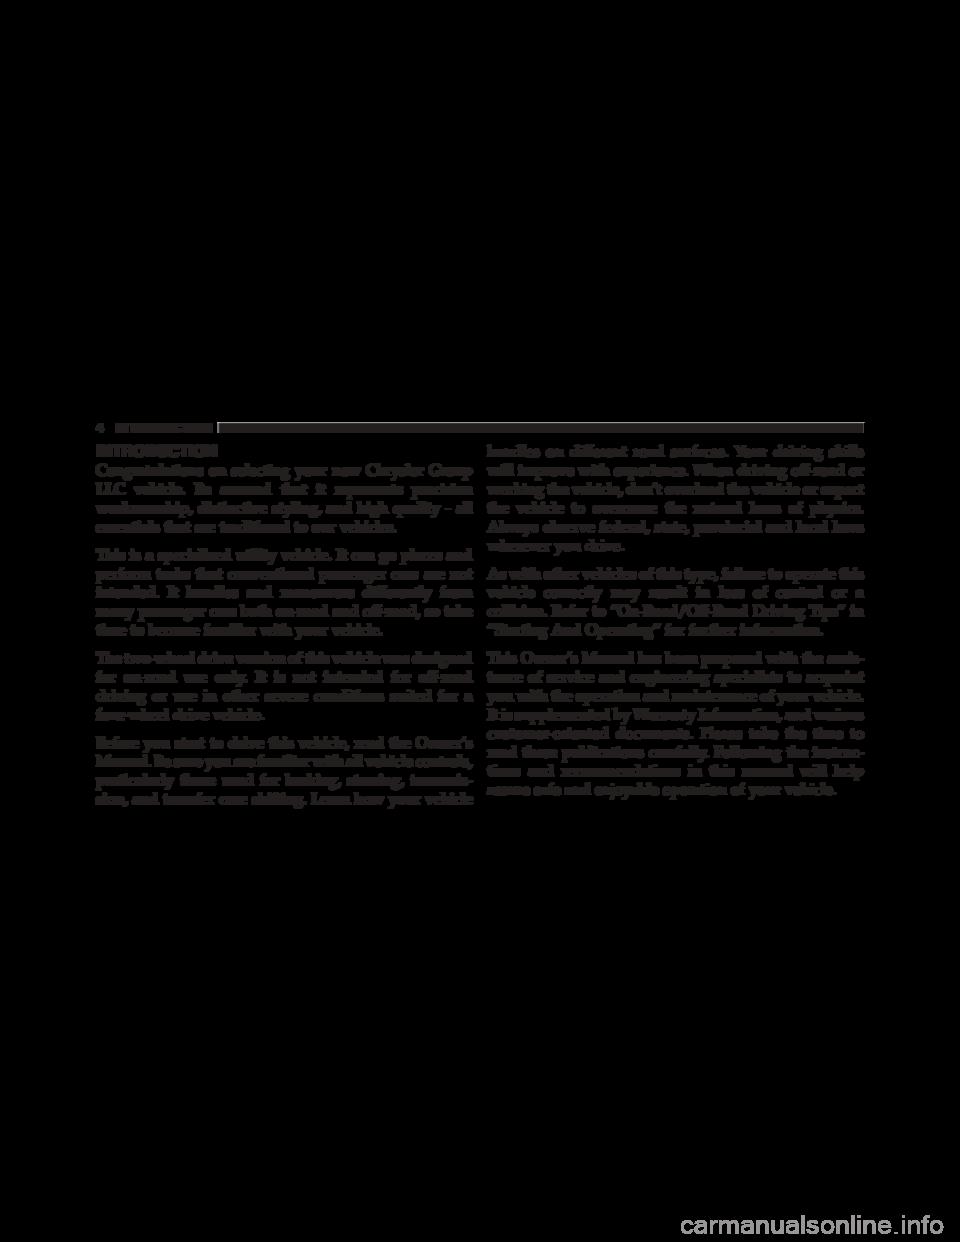 2012 grand cherokee manual pdf